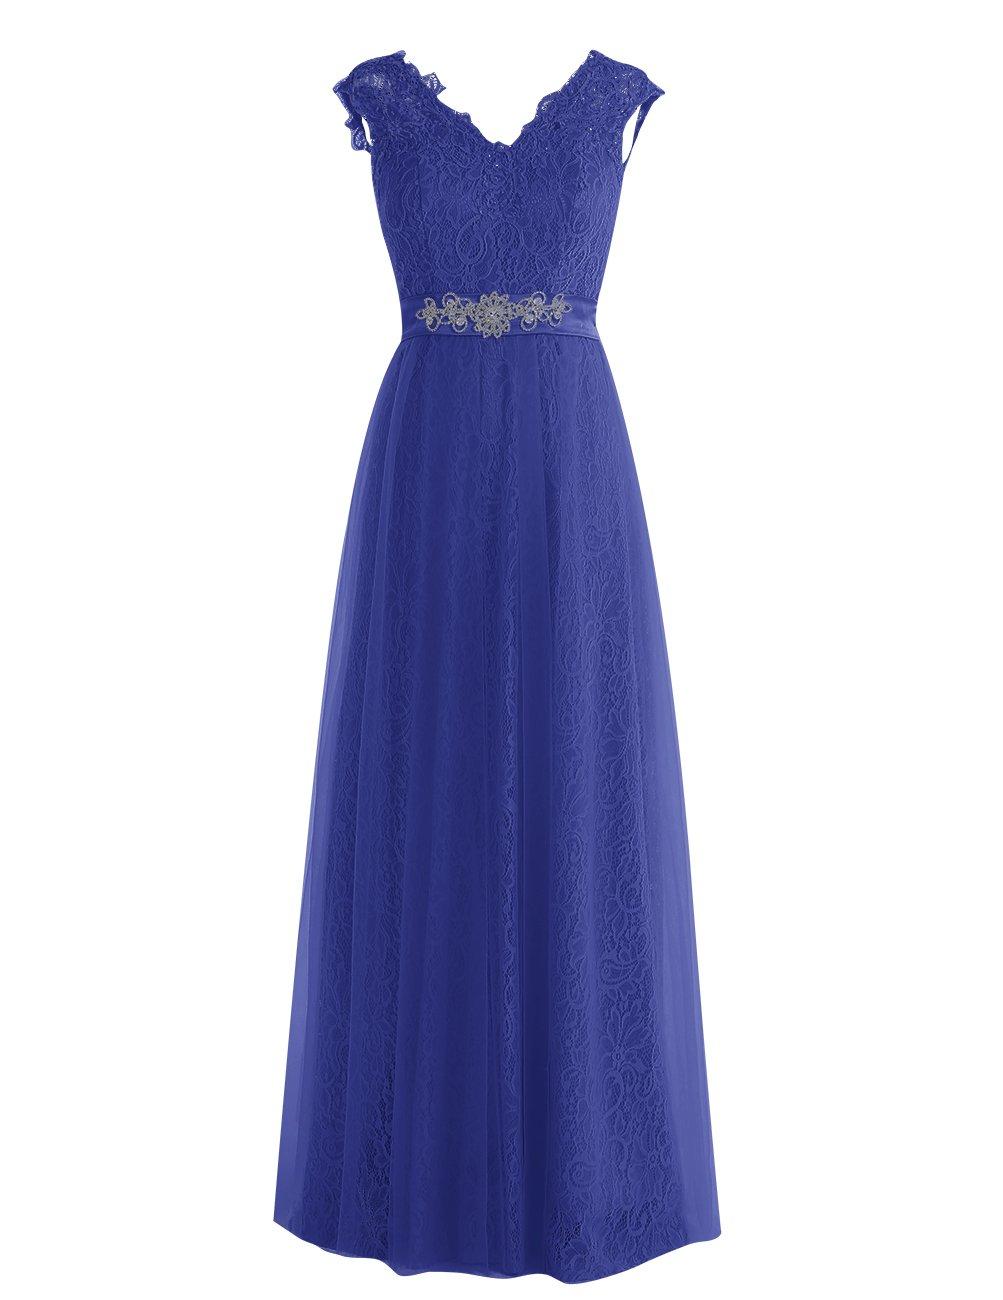 Dresstell レディーズ ロング丈 披露宴ドレス 結婚式ドレス 総レースのお呼ばれ フォーマルドレス キラキラビジュー付き ビスチェタイプ 編み上げの花嫁ワンピース 二次会ドレス ステージドレス B01M157CJ6 JP9|ロイヤルブルー ロイヤルブルー JP9